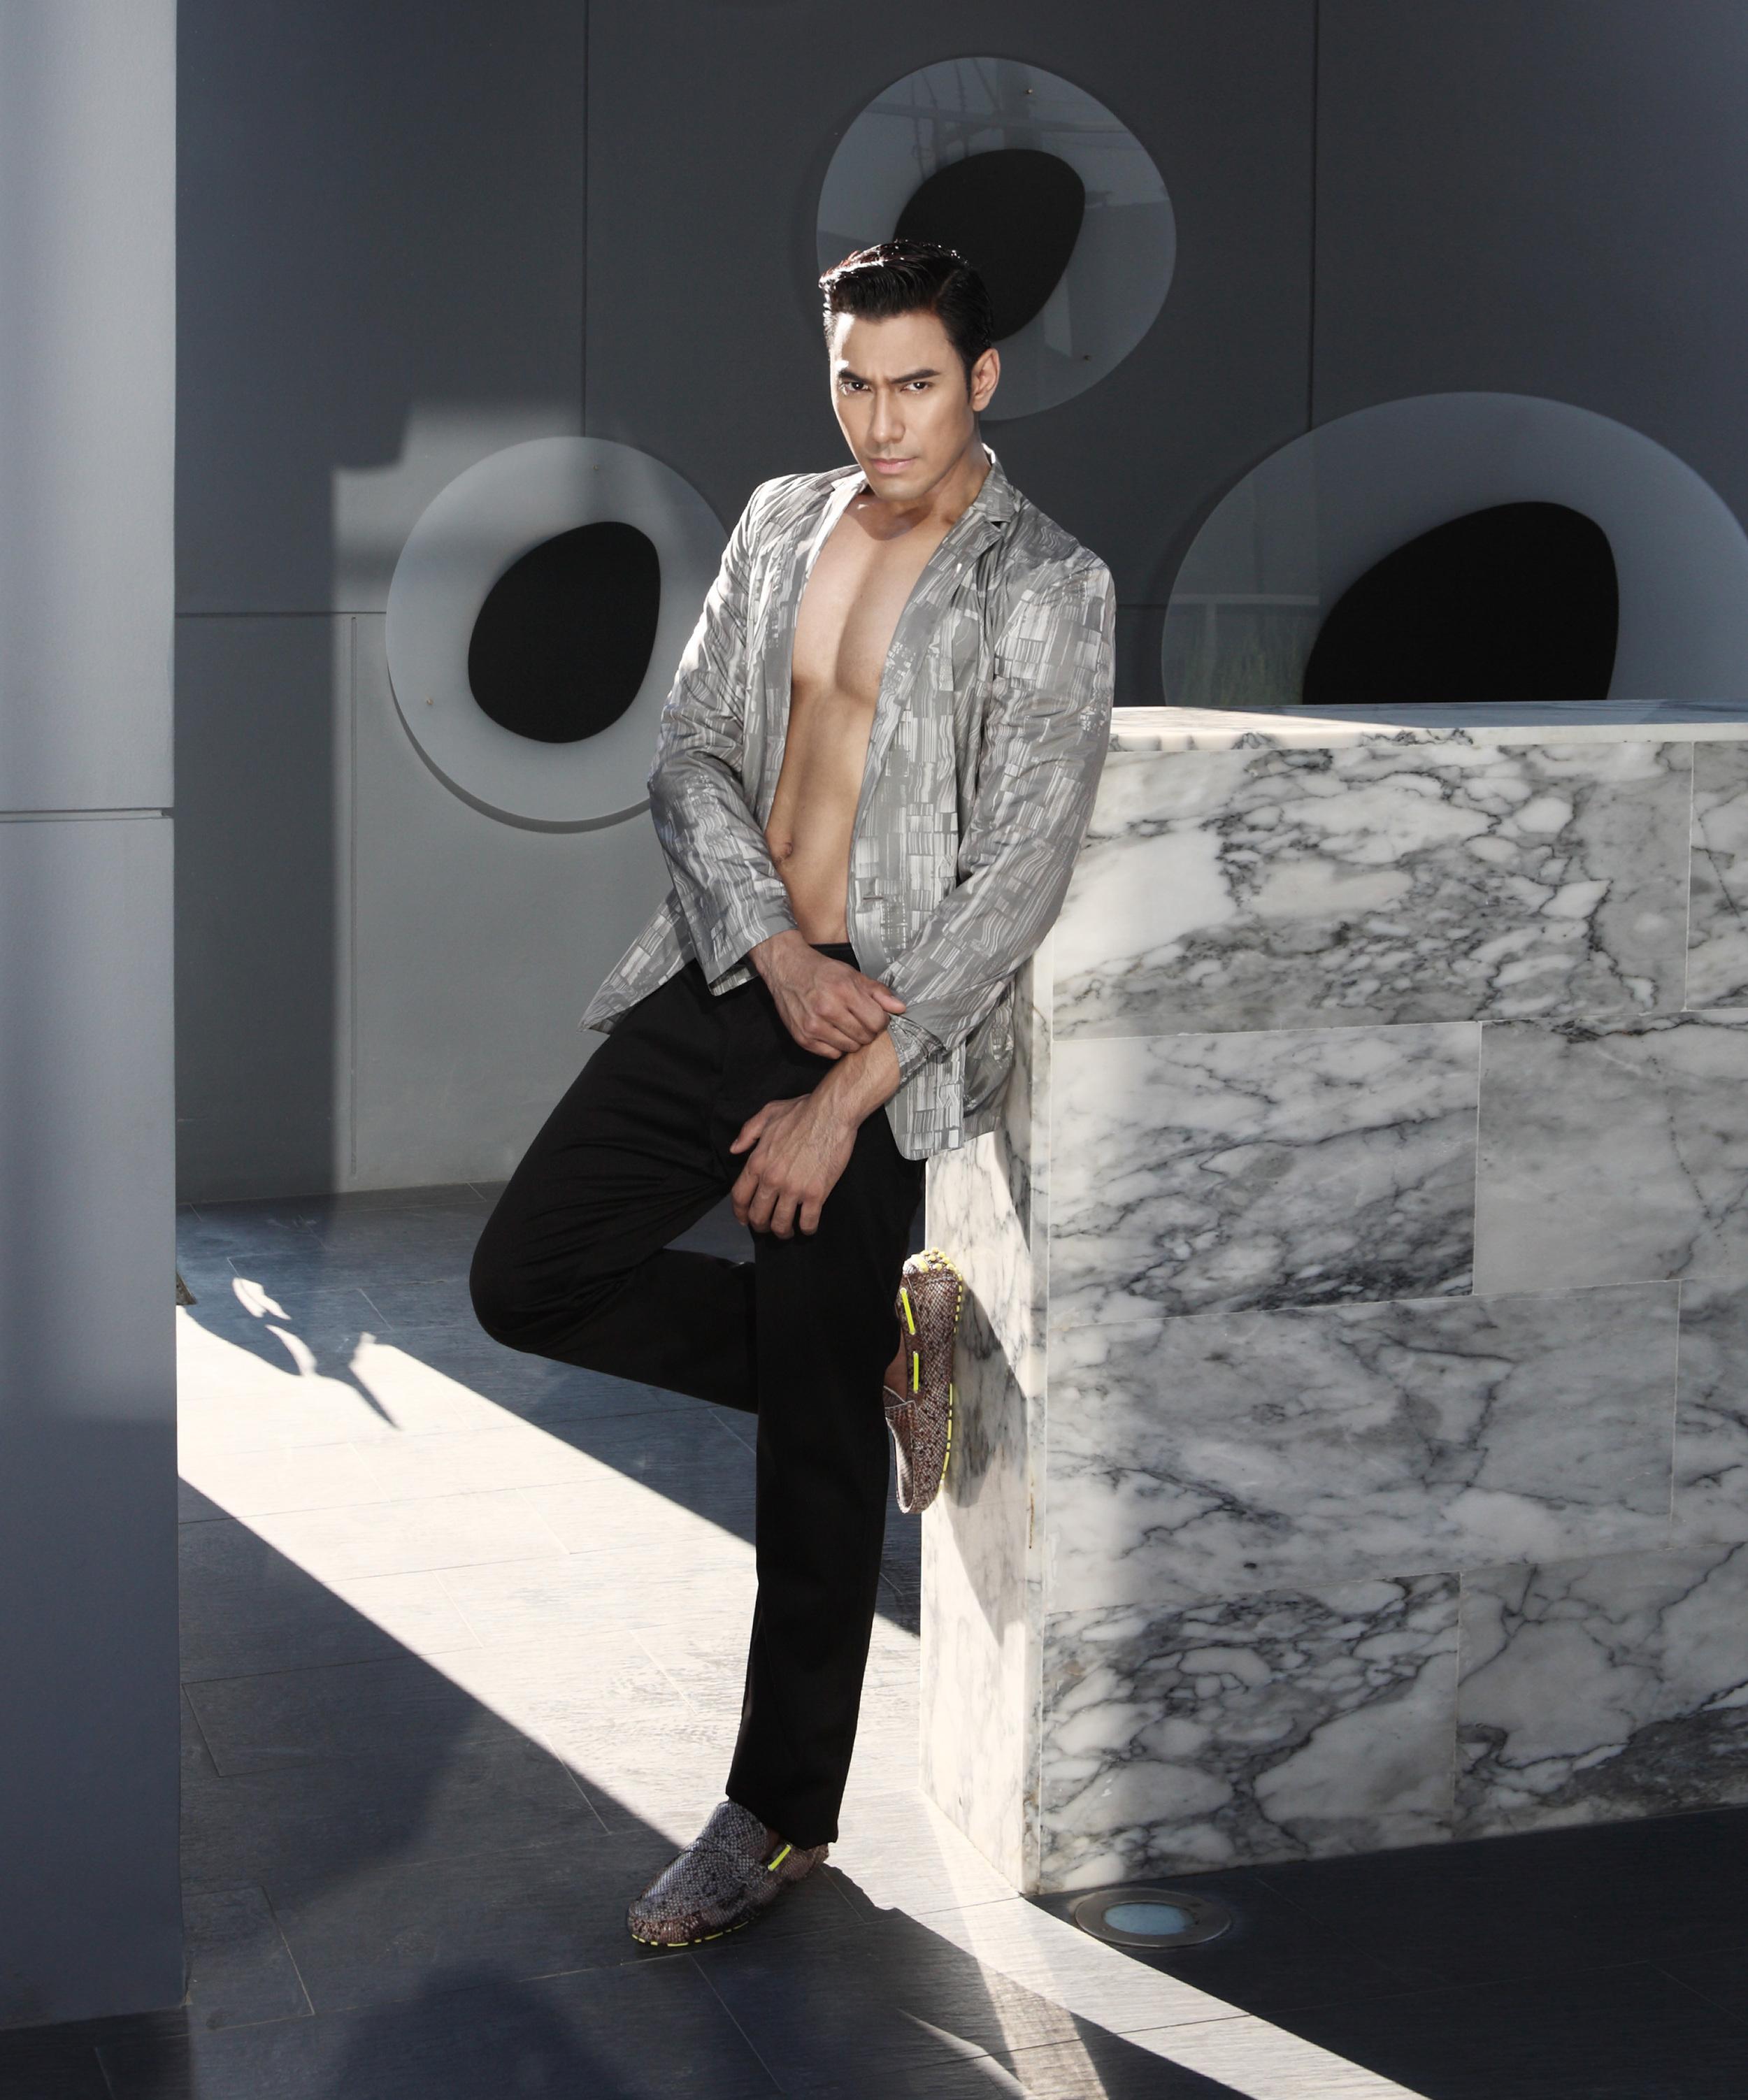 clothes : Calvin Klien Collection / shoes : Pedro